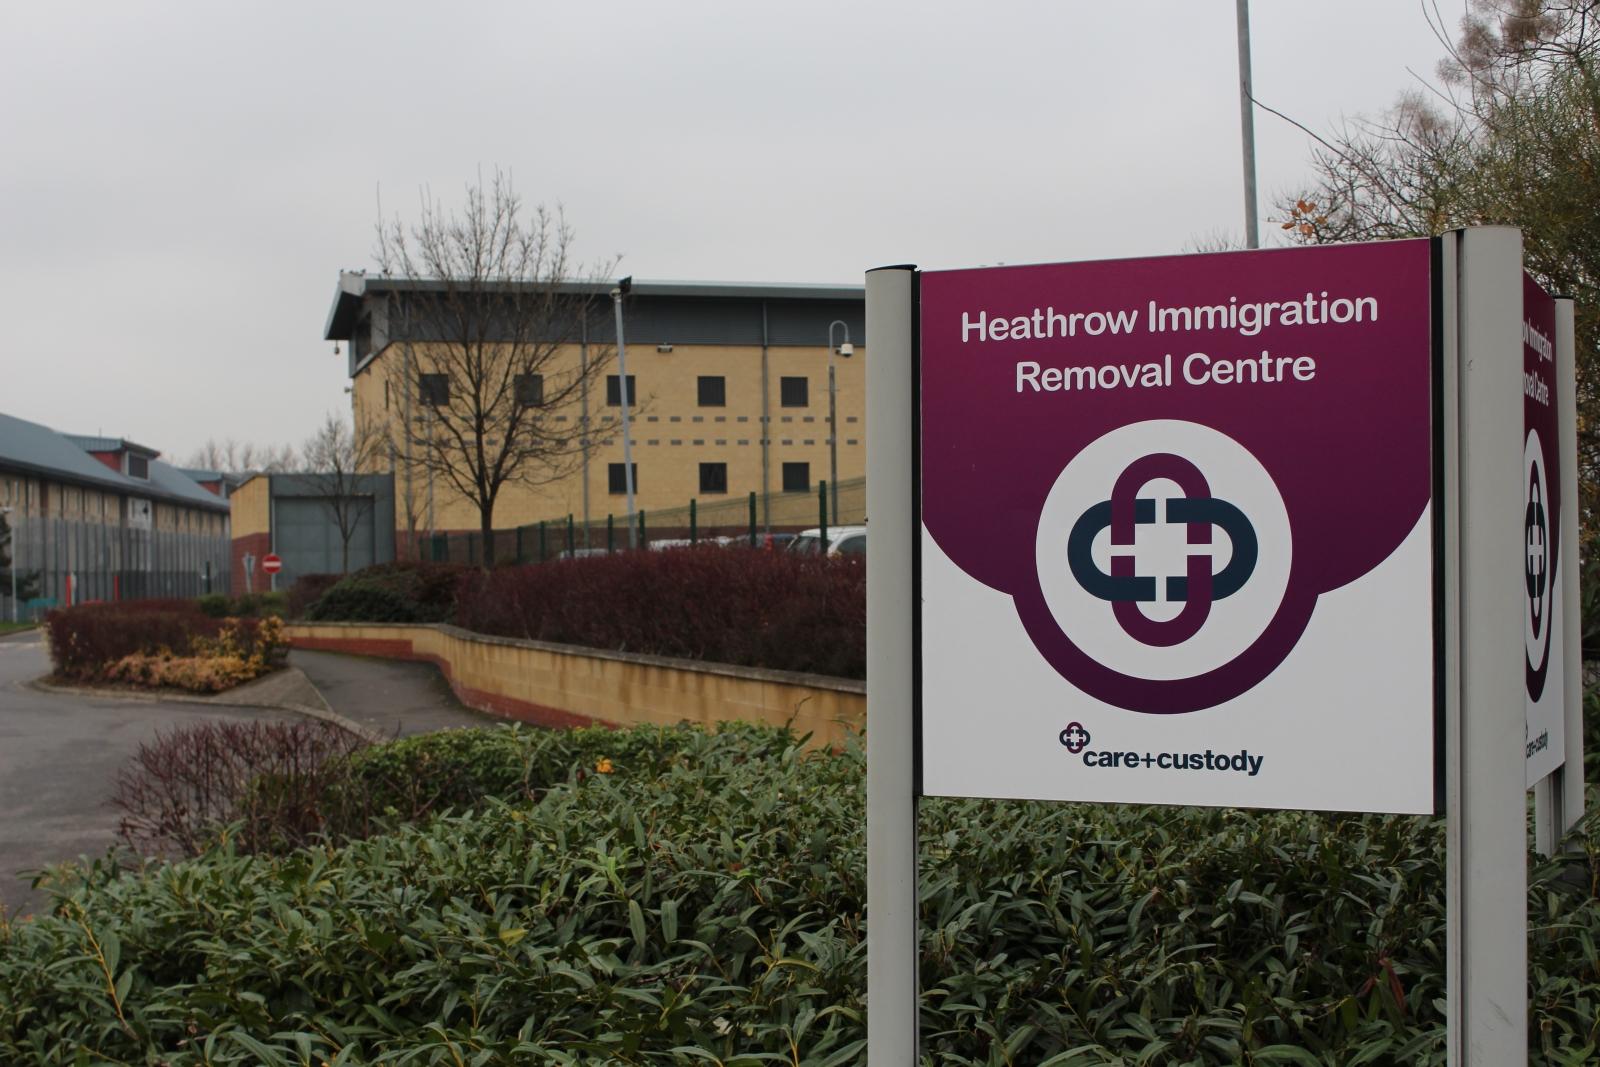 removal centre